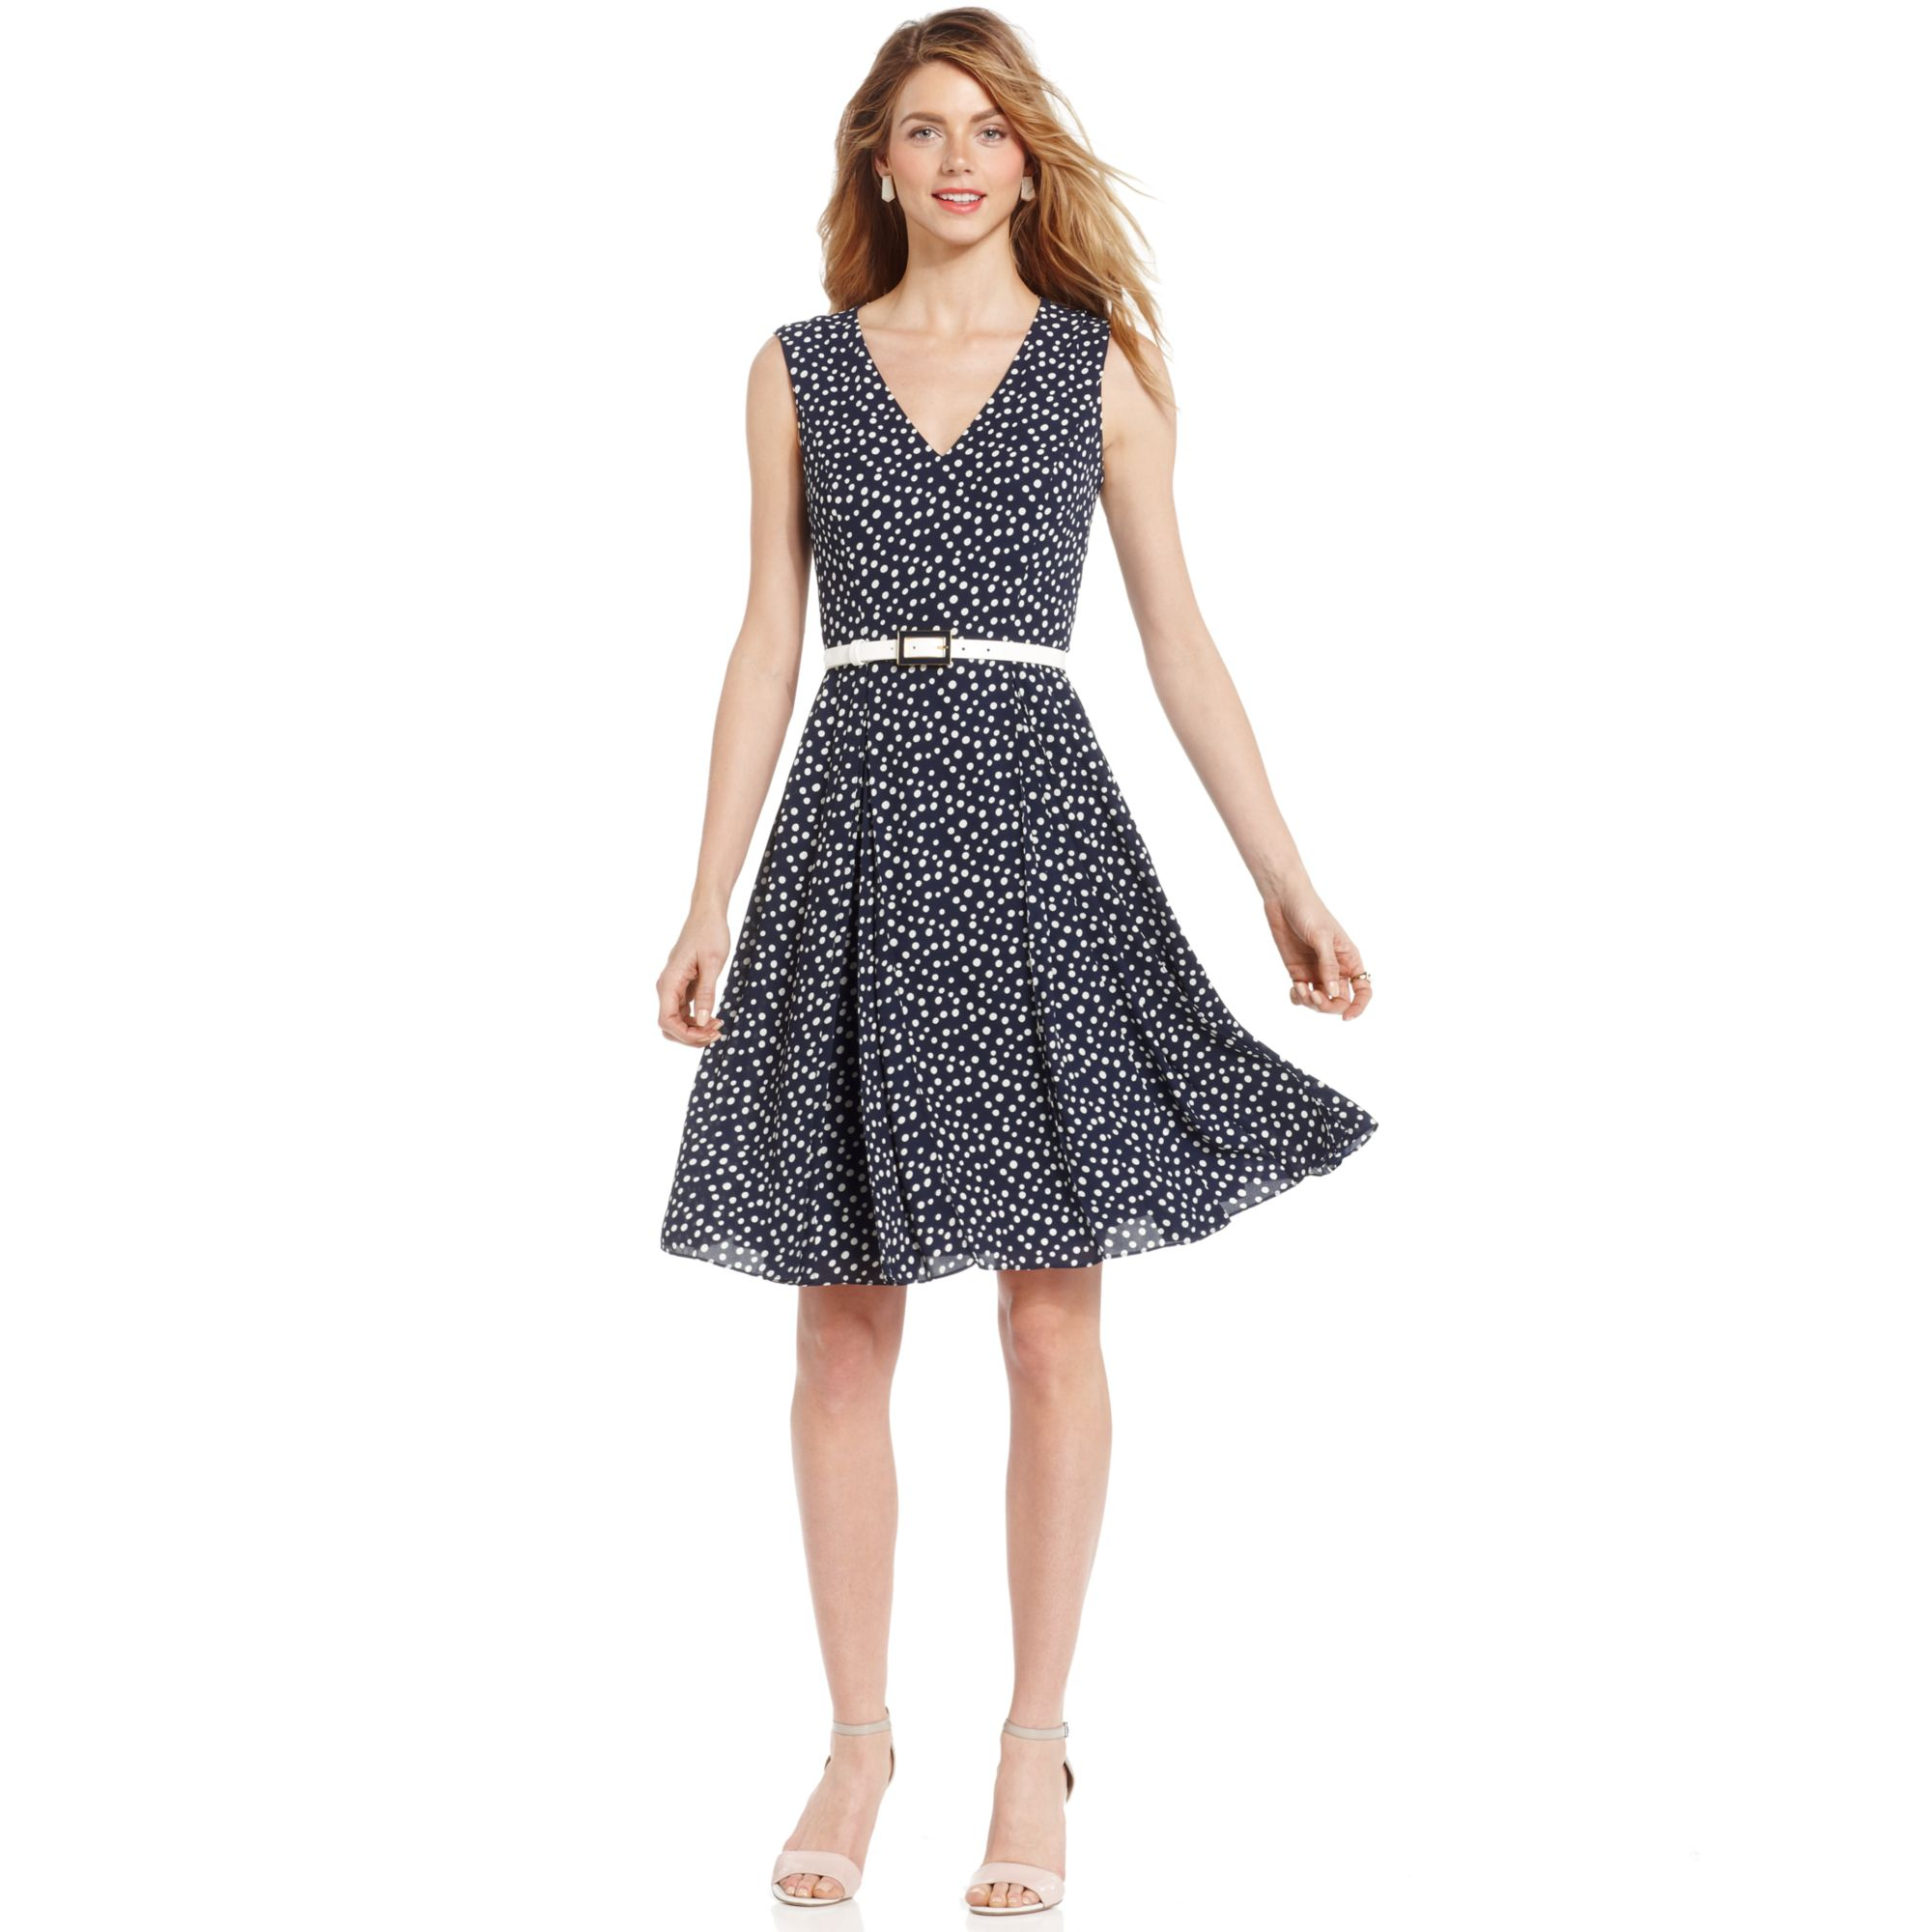 Lyst Anne Klein Petite Sleeveless Belted Polkadot Dress